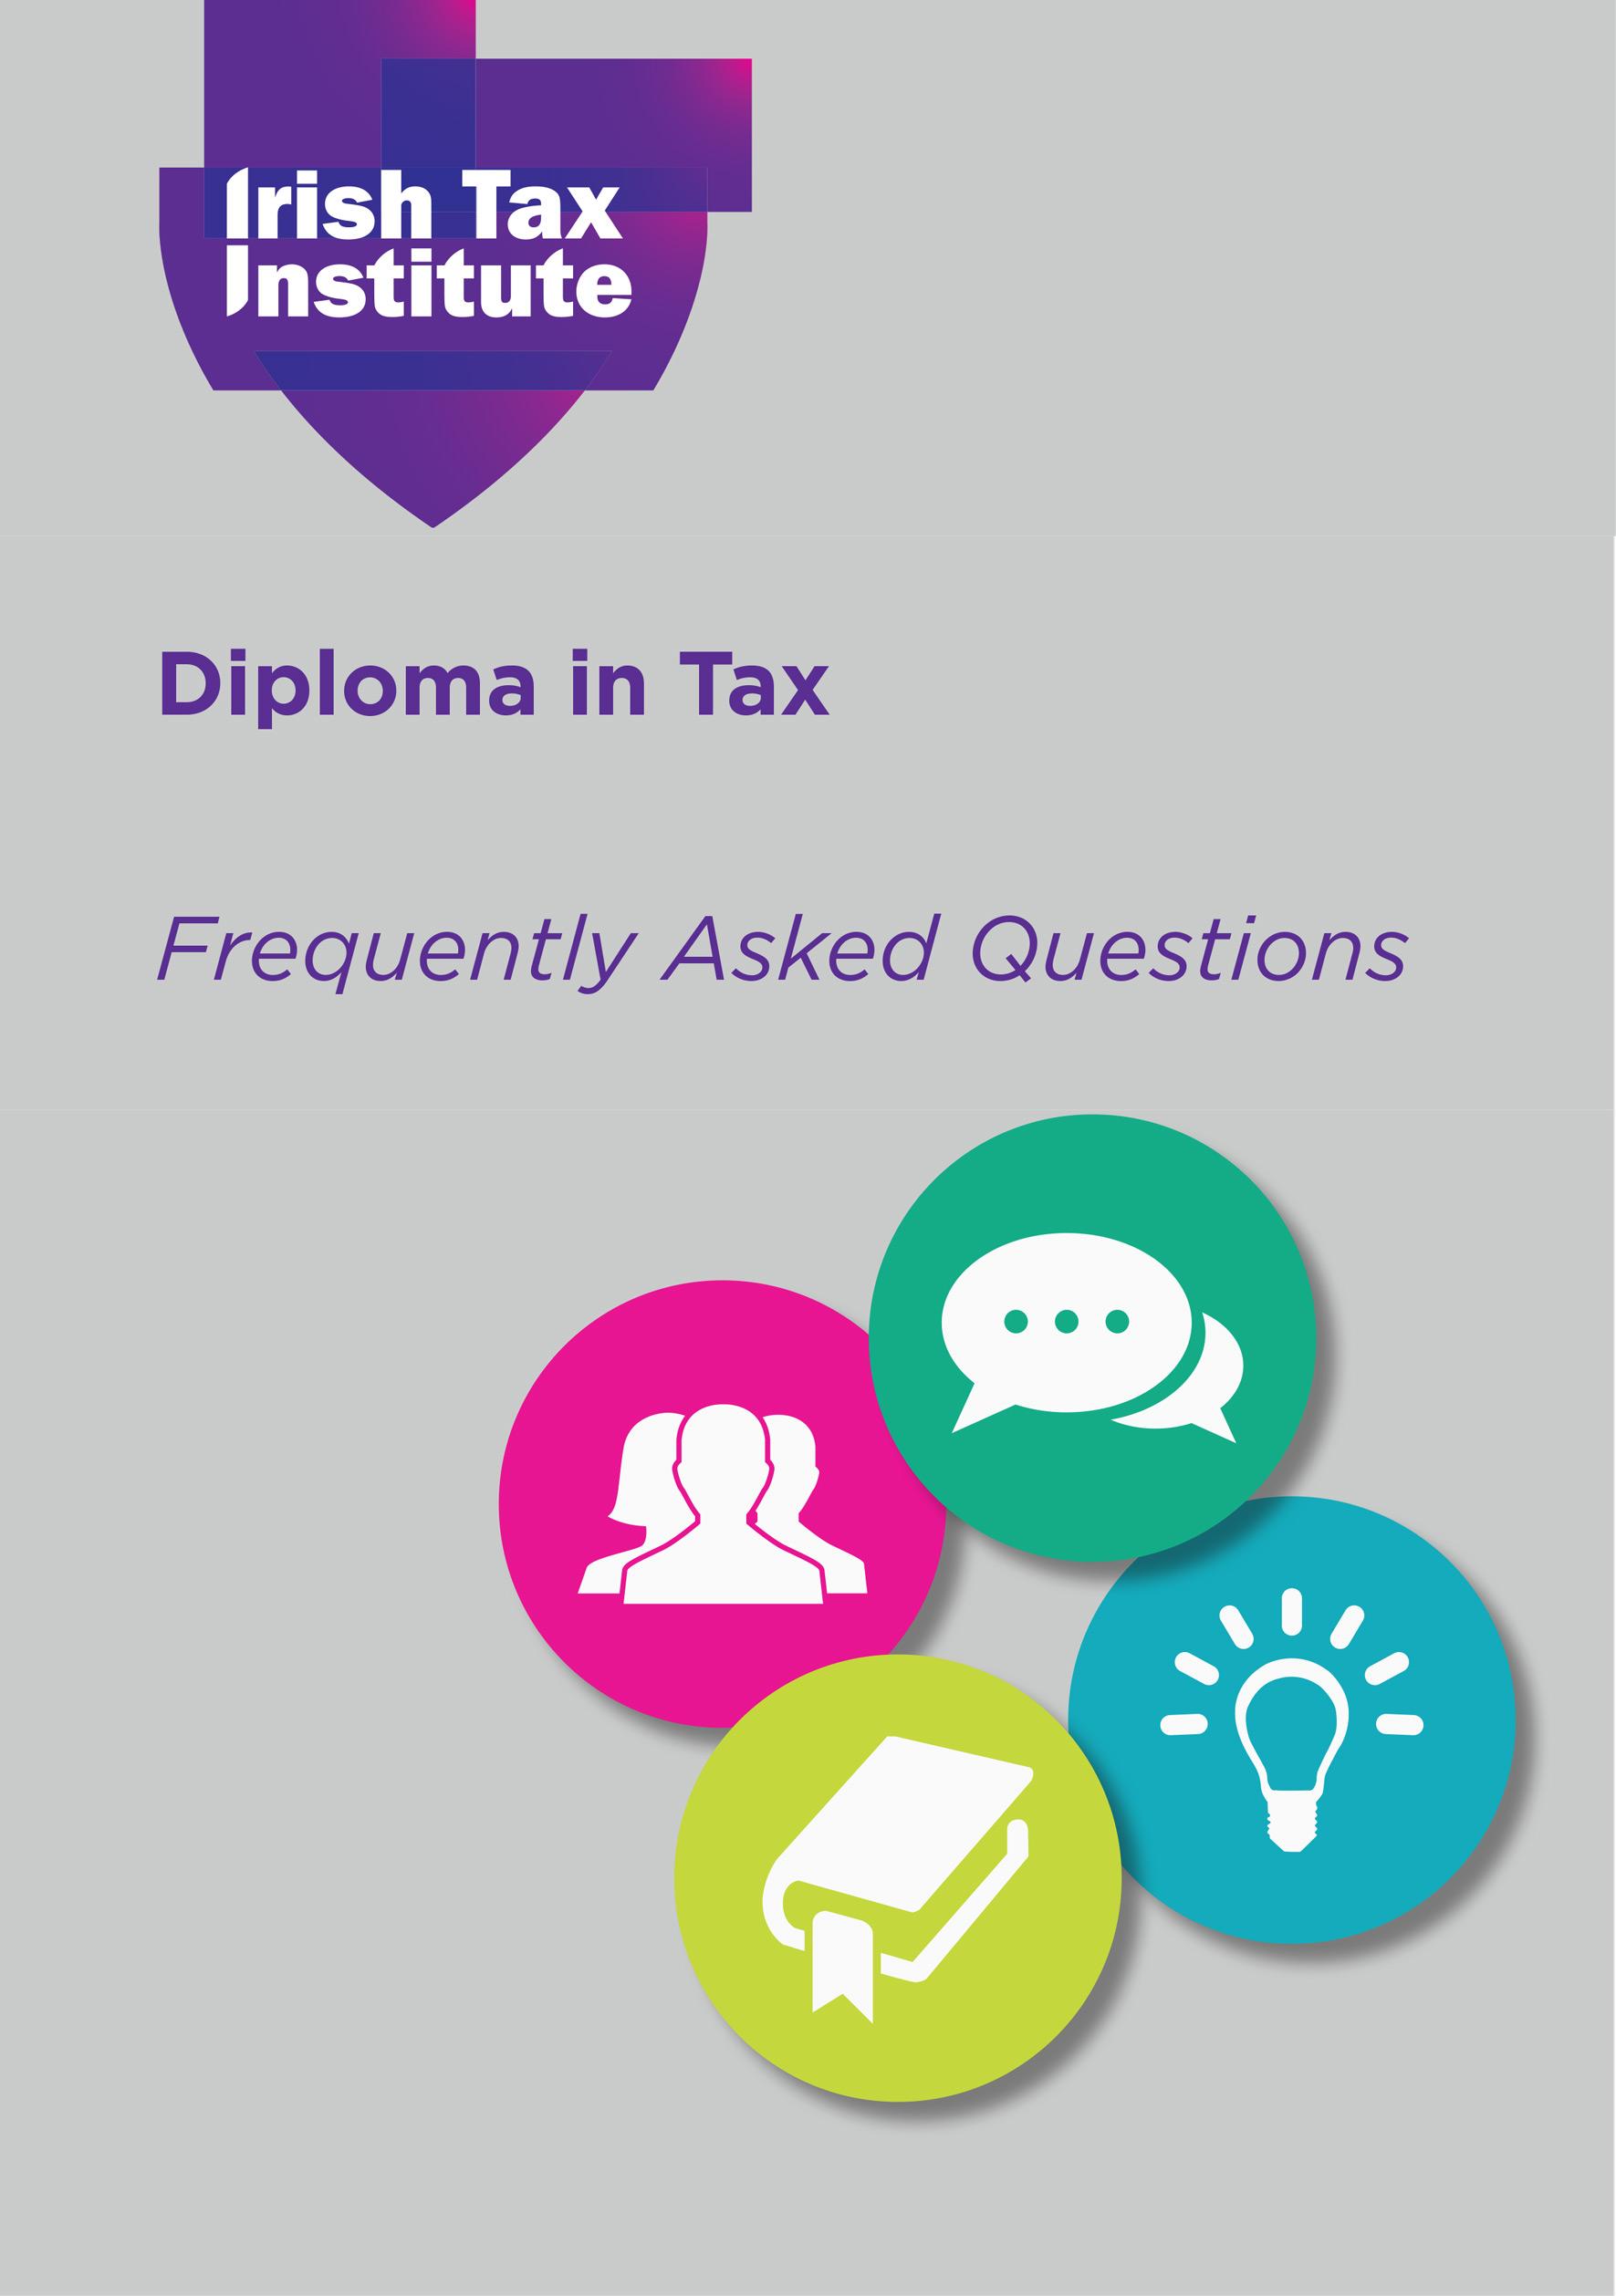 Factsheet on Diploma in Tax